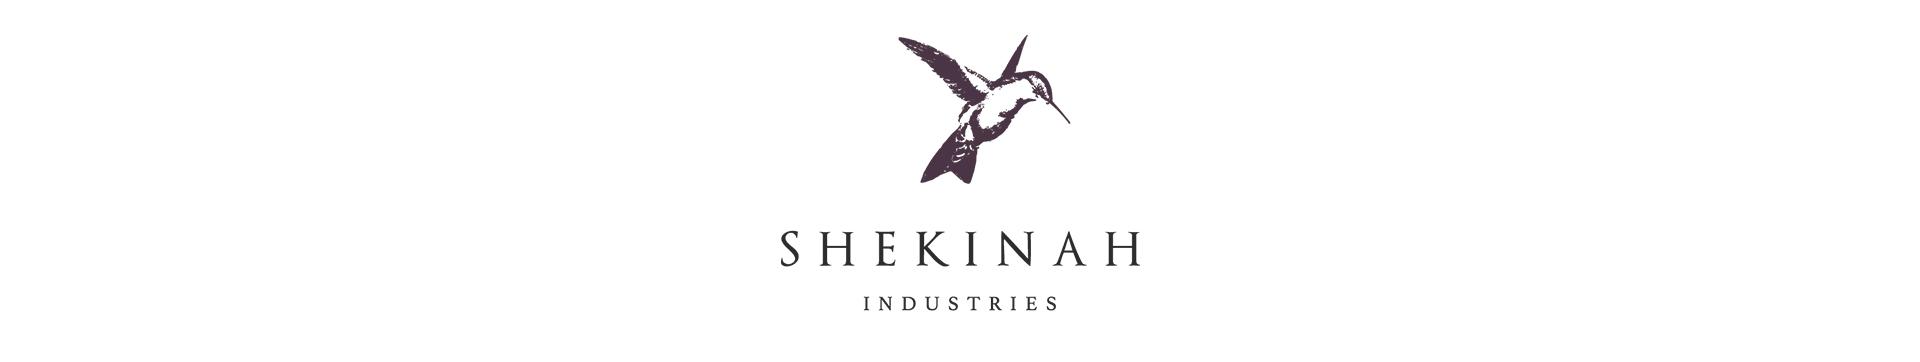 Shekinah Main Logo Banner.jpg